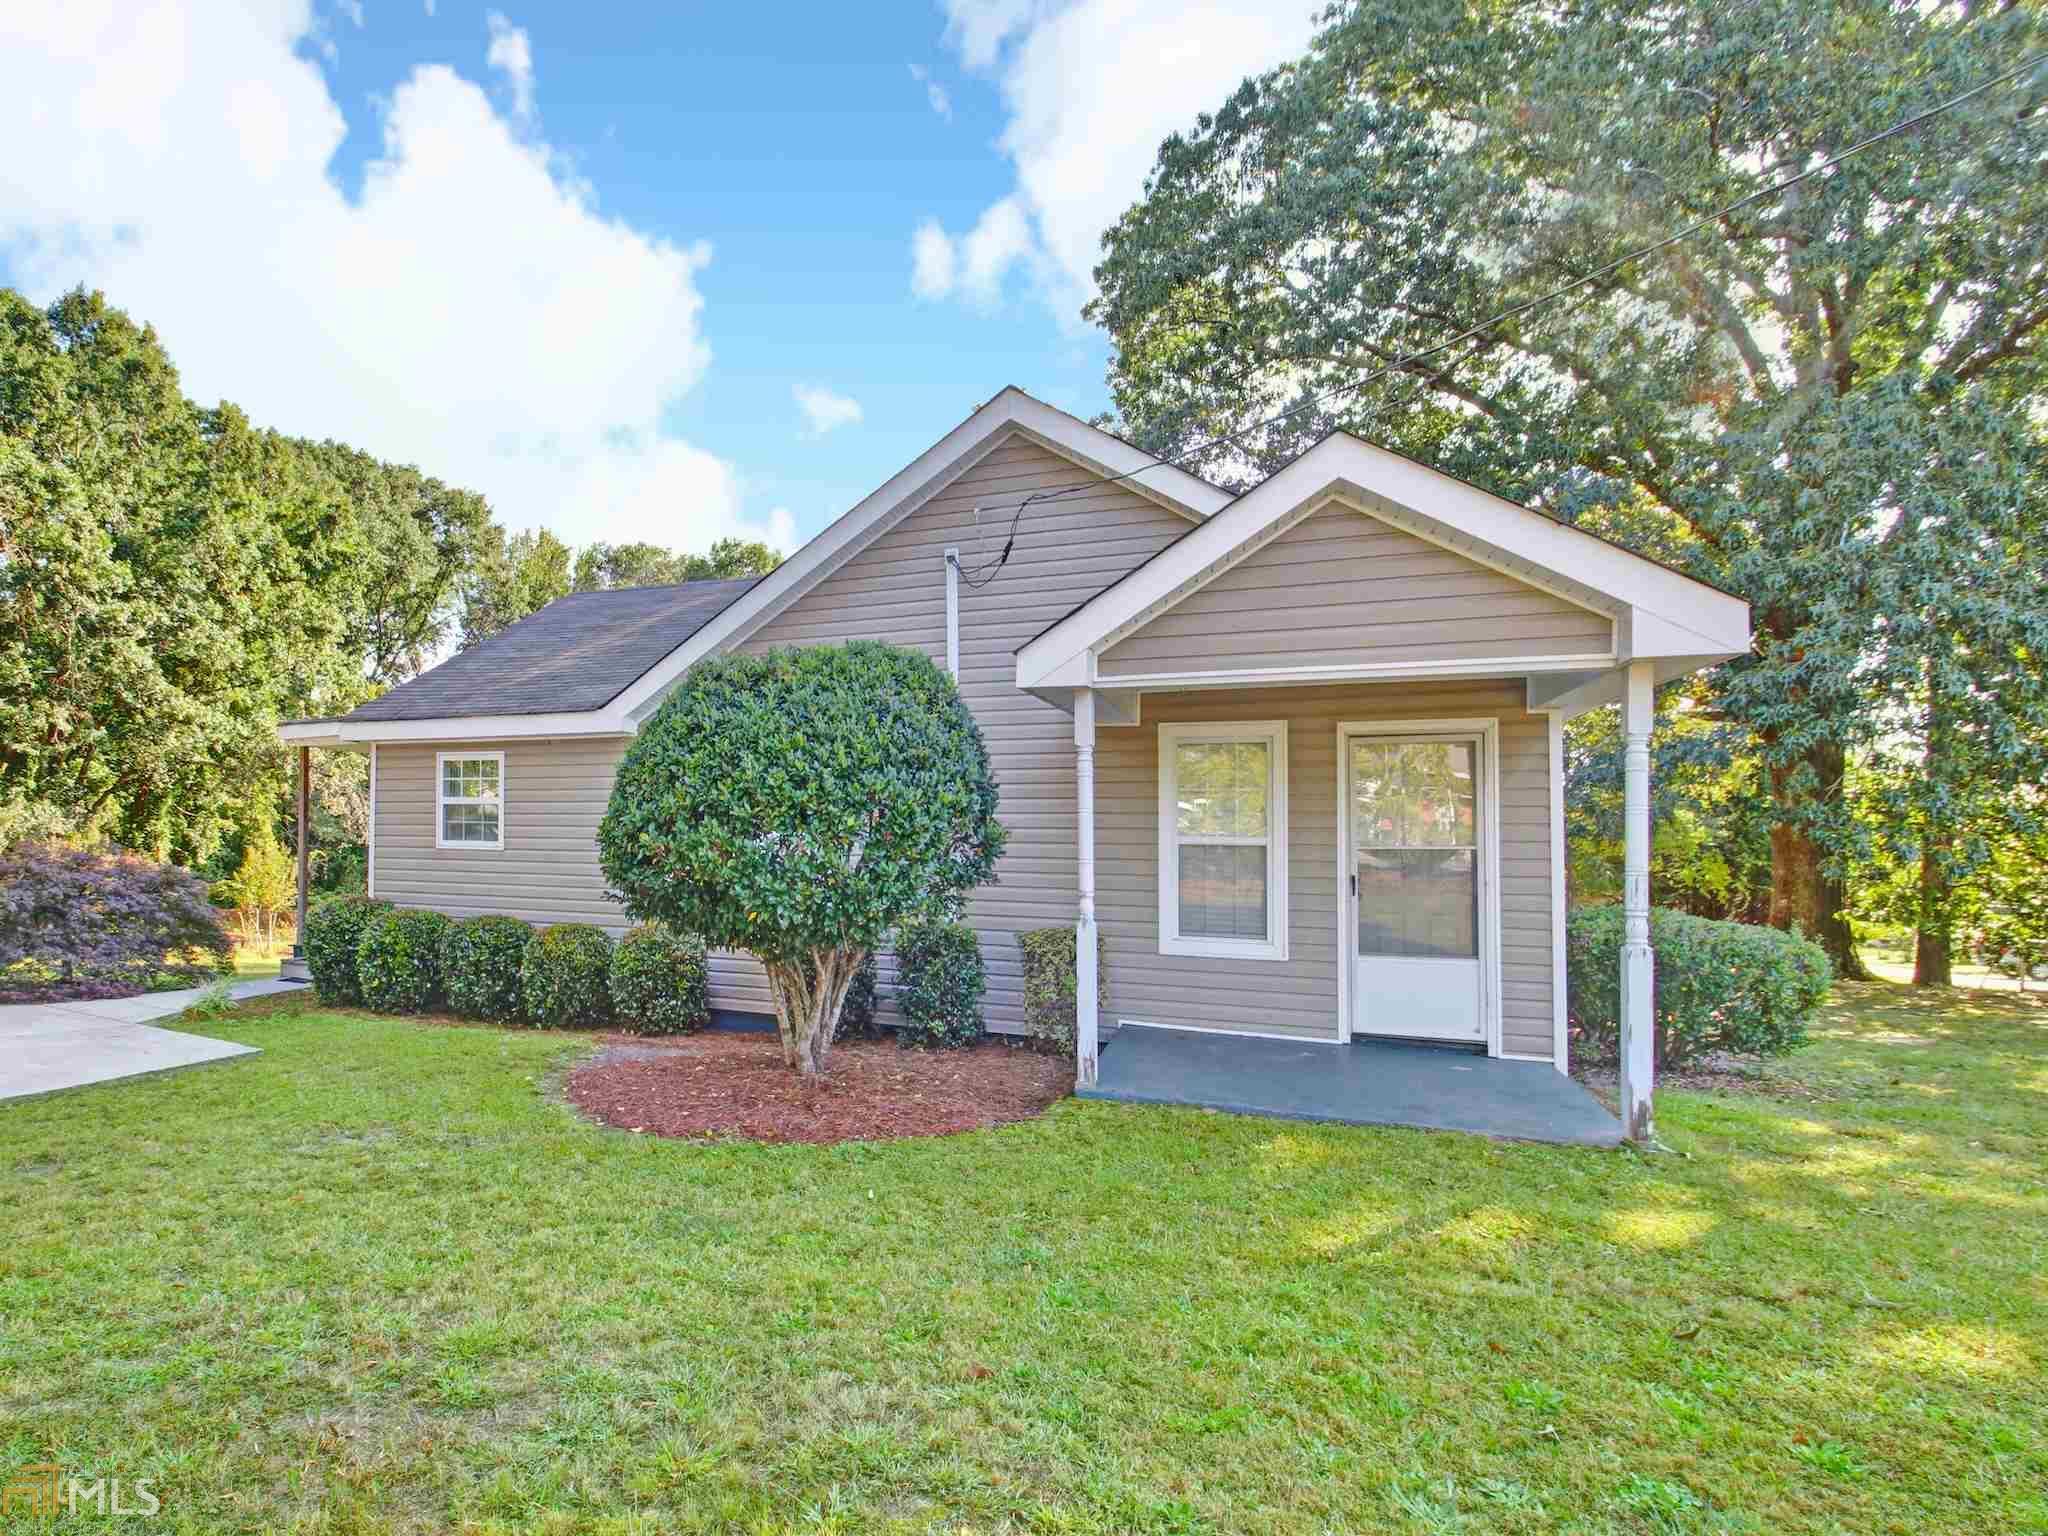 6265 Hospital Way, Douglasville, Georgia 30134, 2 Bedrooms Bedrooms, ,1 BathroomBathrooms,Single Family,For Sale,6265 Hospital Way,1,8971853